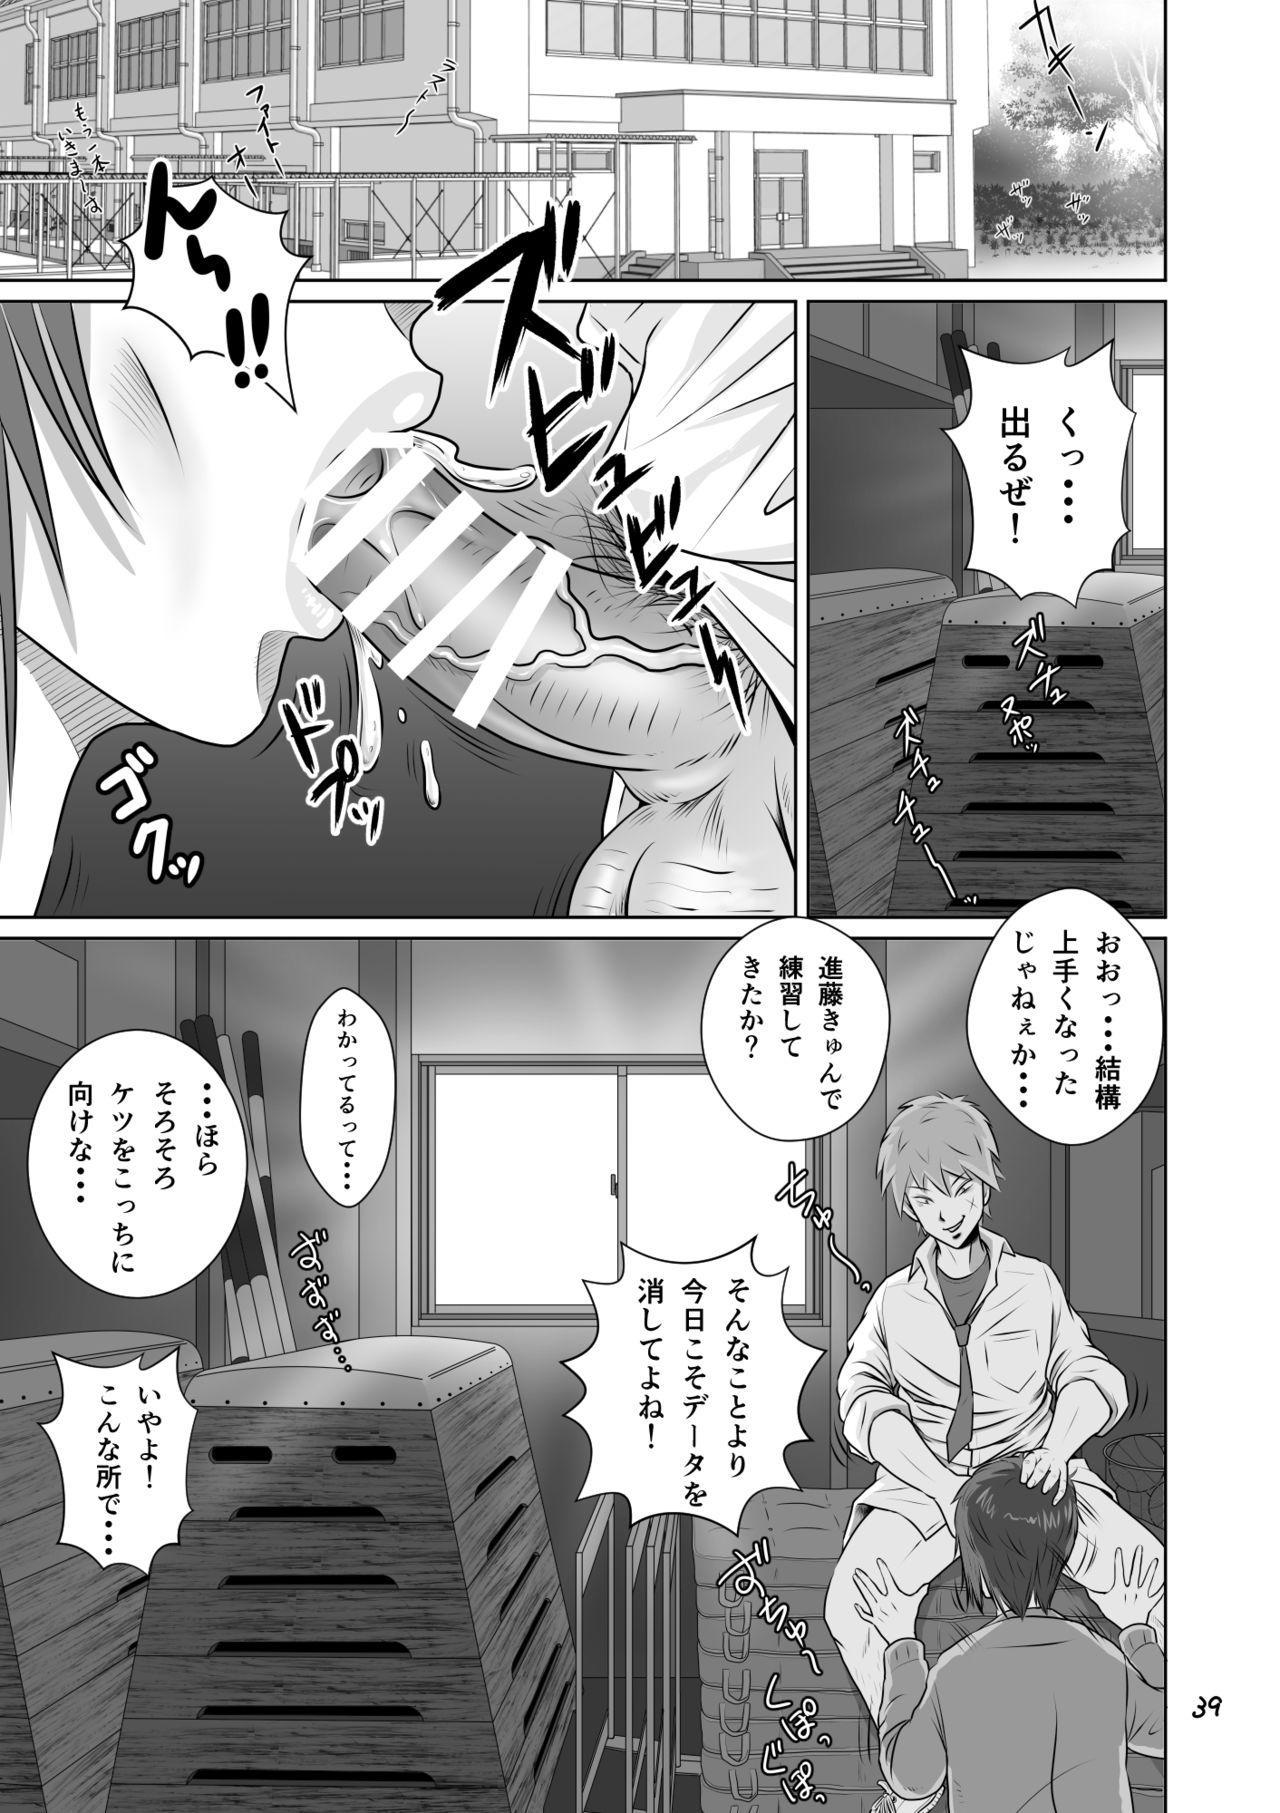 Netorare Osananajimi Haruka-chan Kiki Ippatsu!! 39